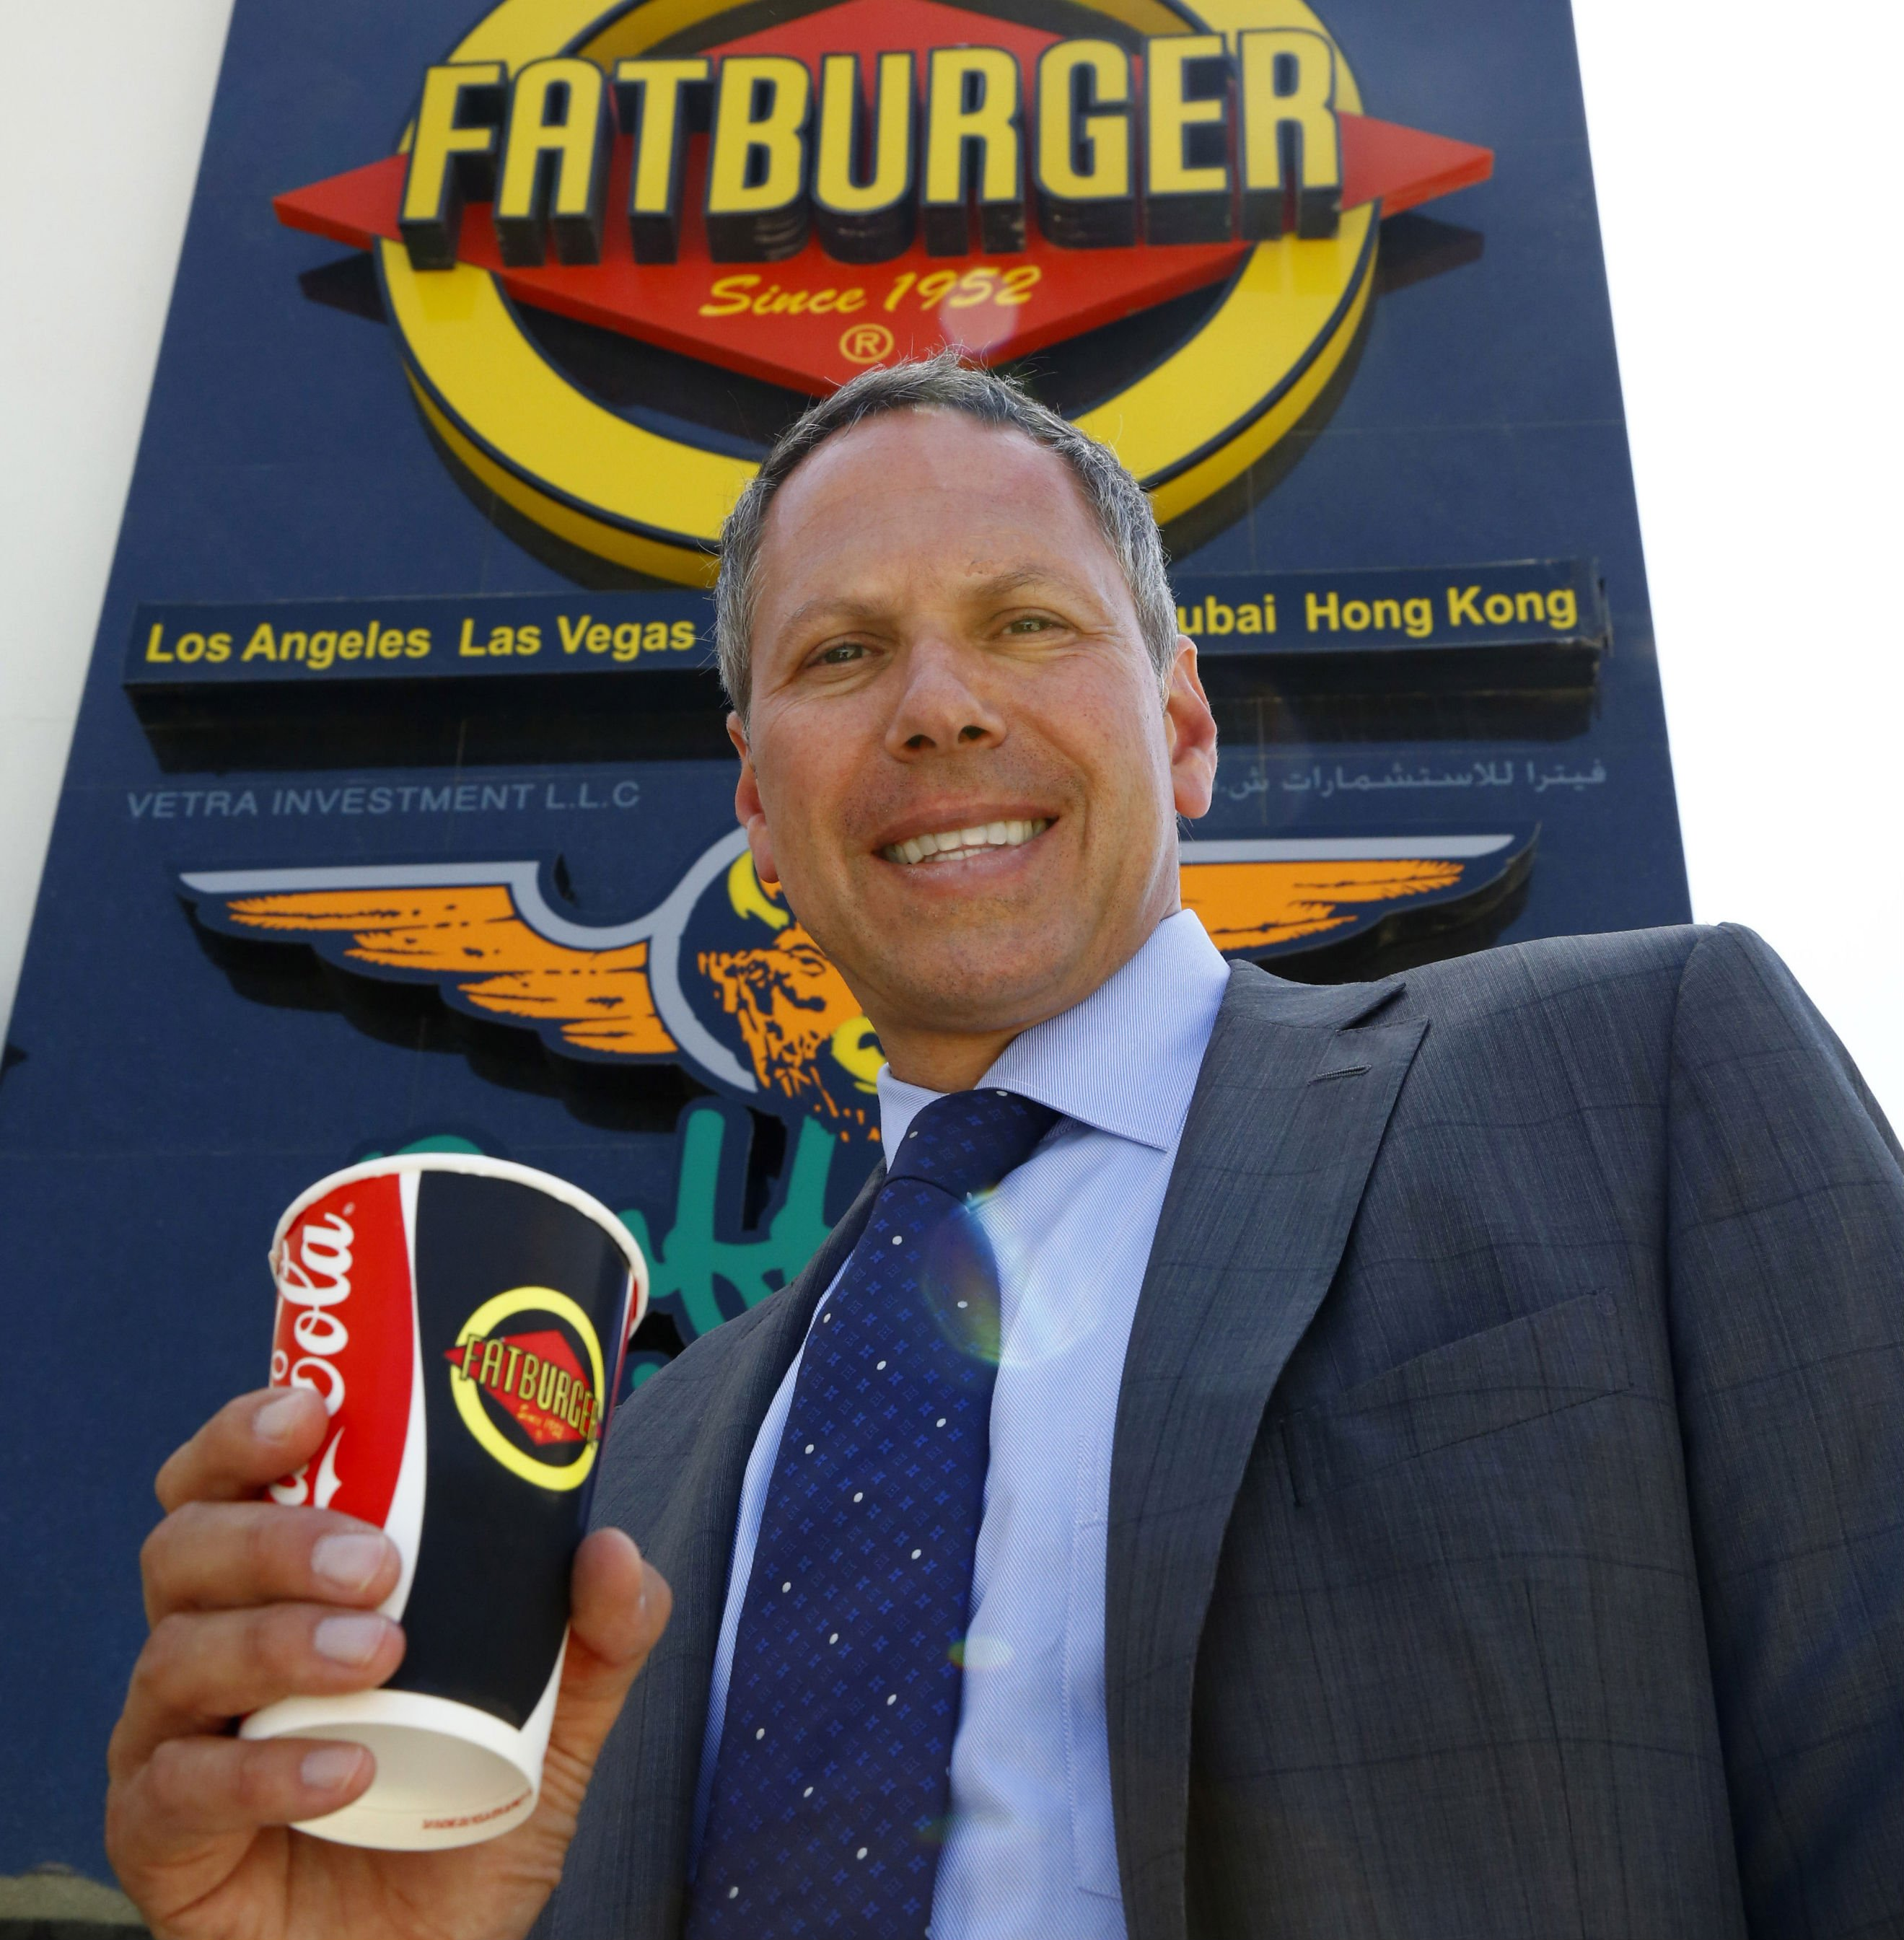 Fatburger Plots Four More Restaurants In MENA